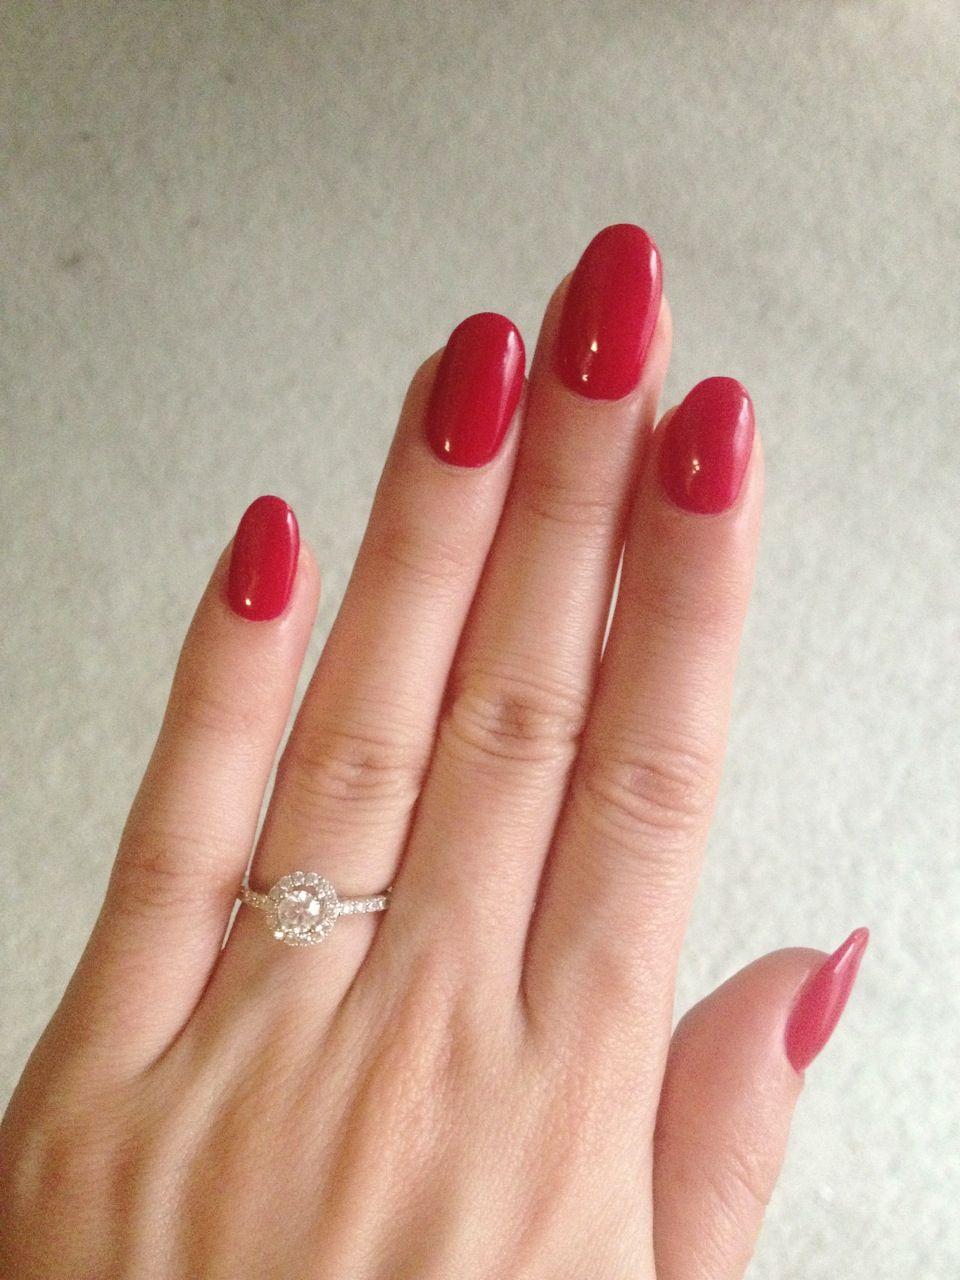 Attractive Red Nails Shellac Motif - Nail Art Ideas - morihati.com